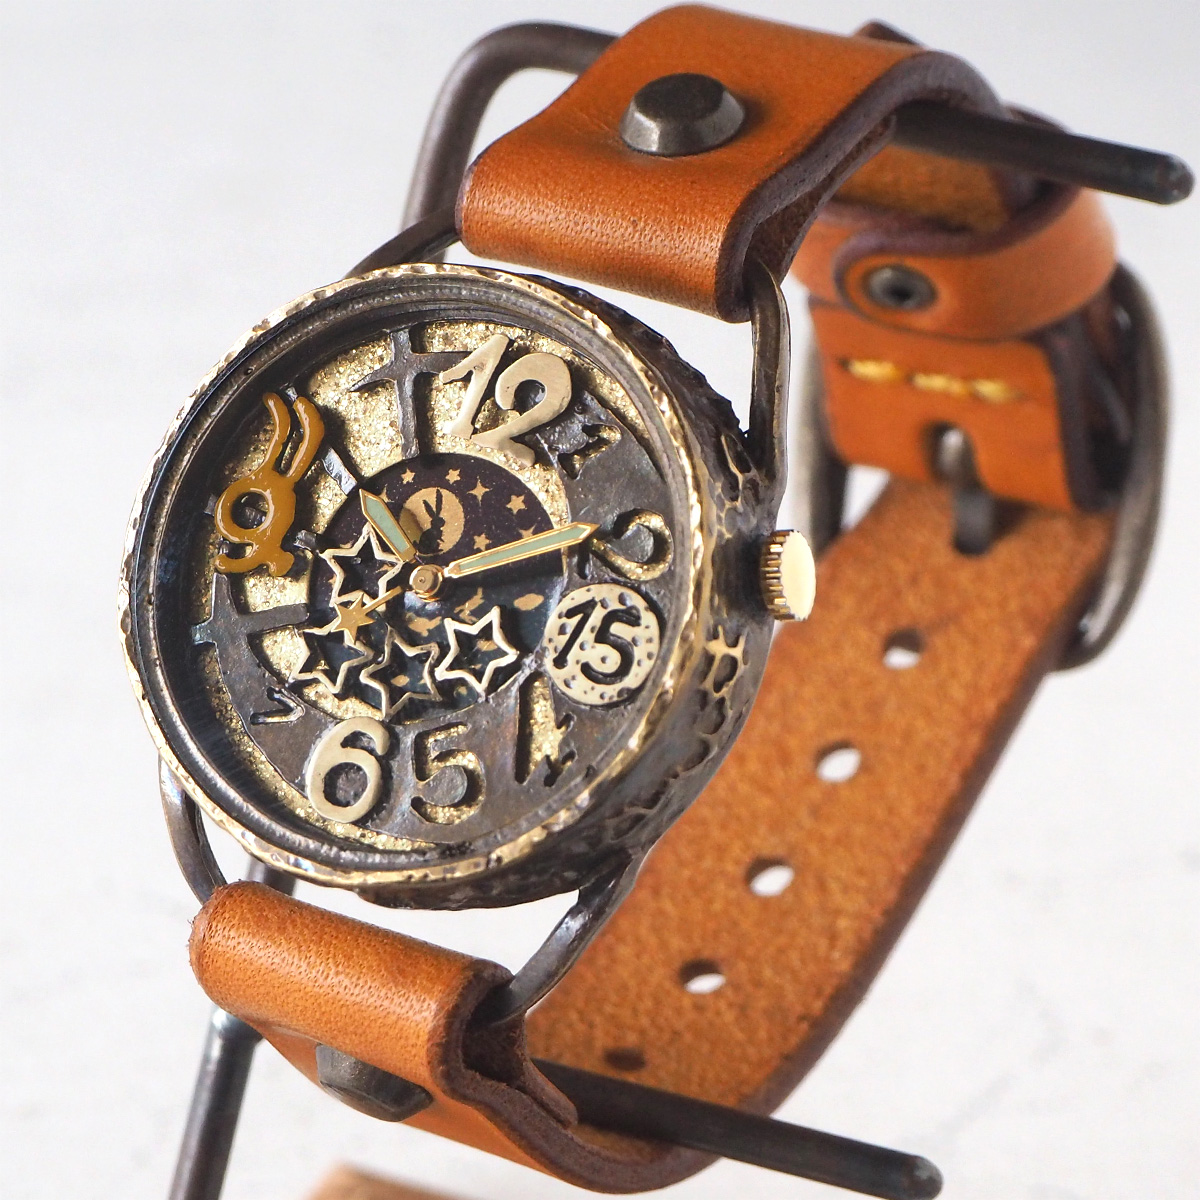 KINO(キノ) 手作り腕時計 うさぴょん SUN&MOON [USAPYON]